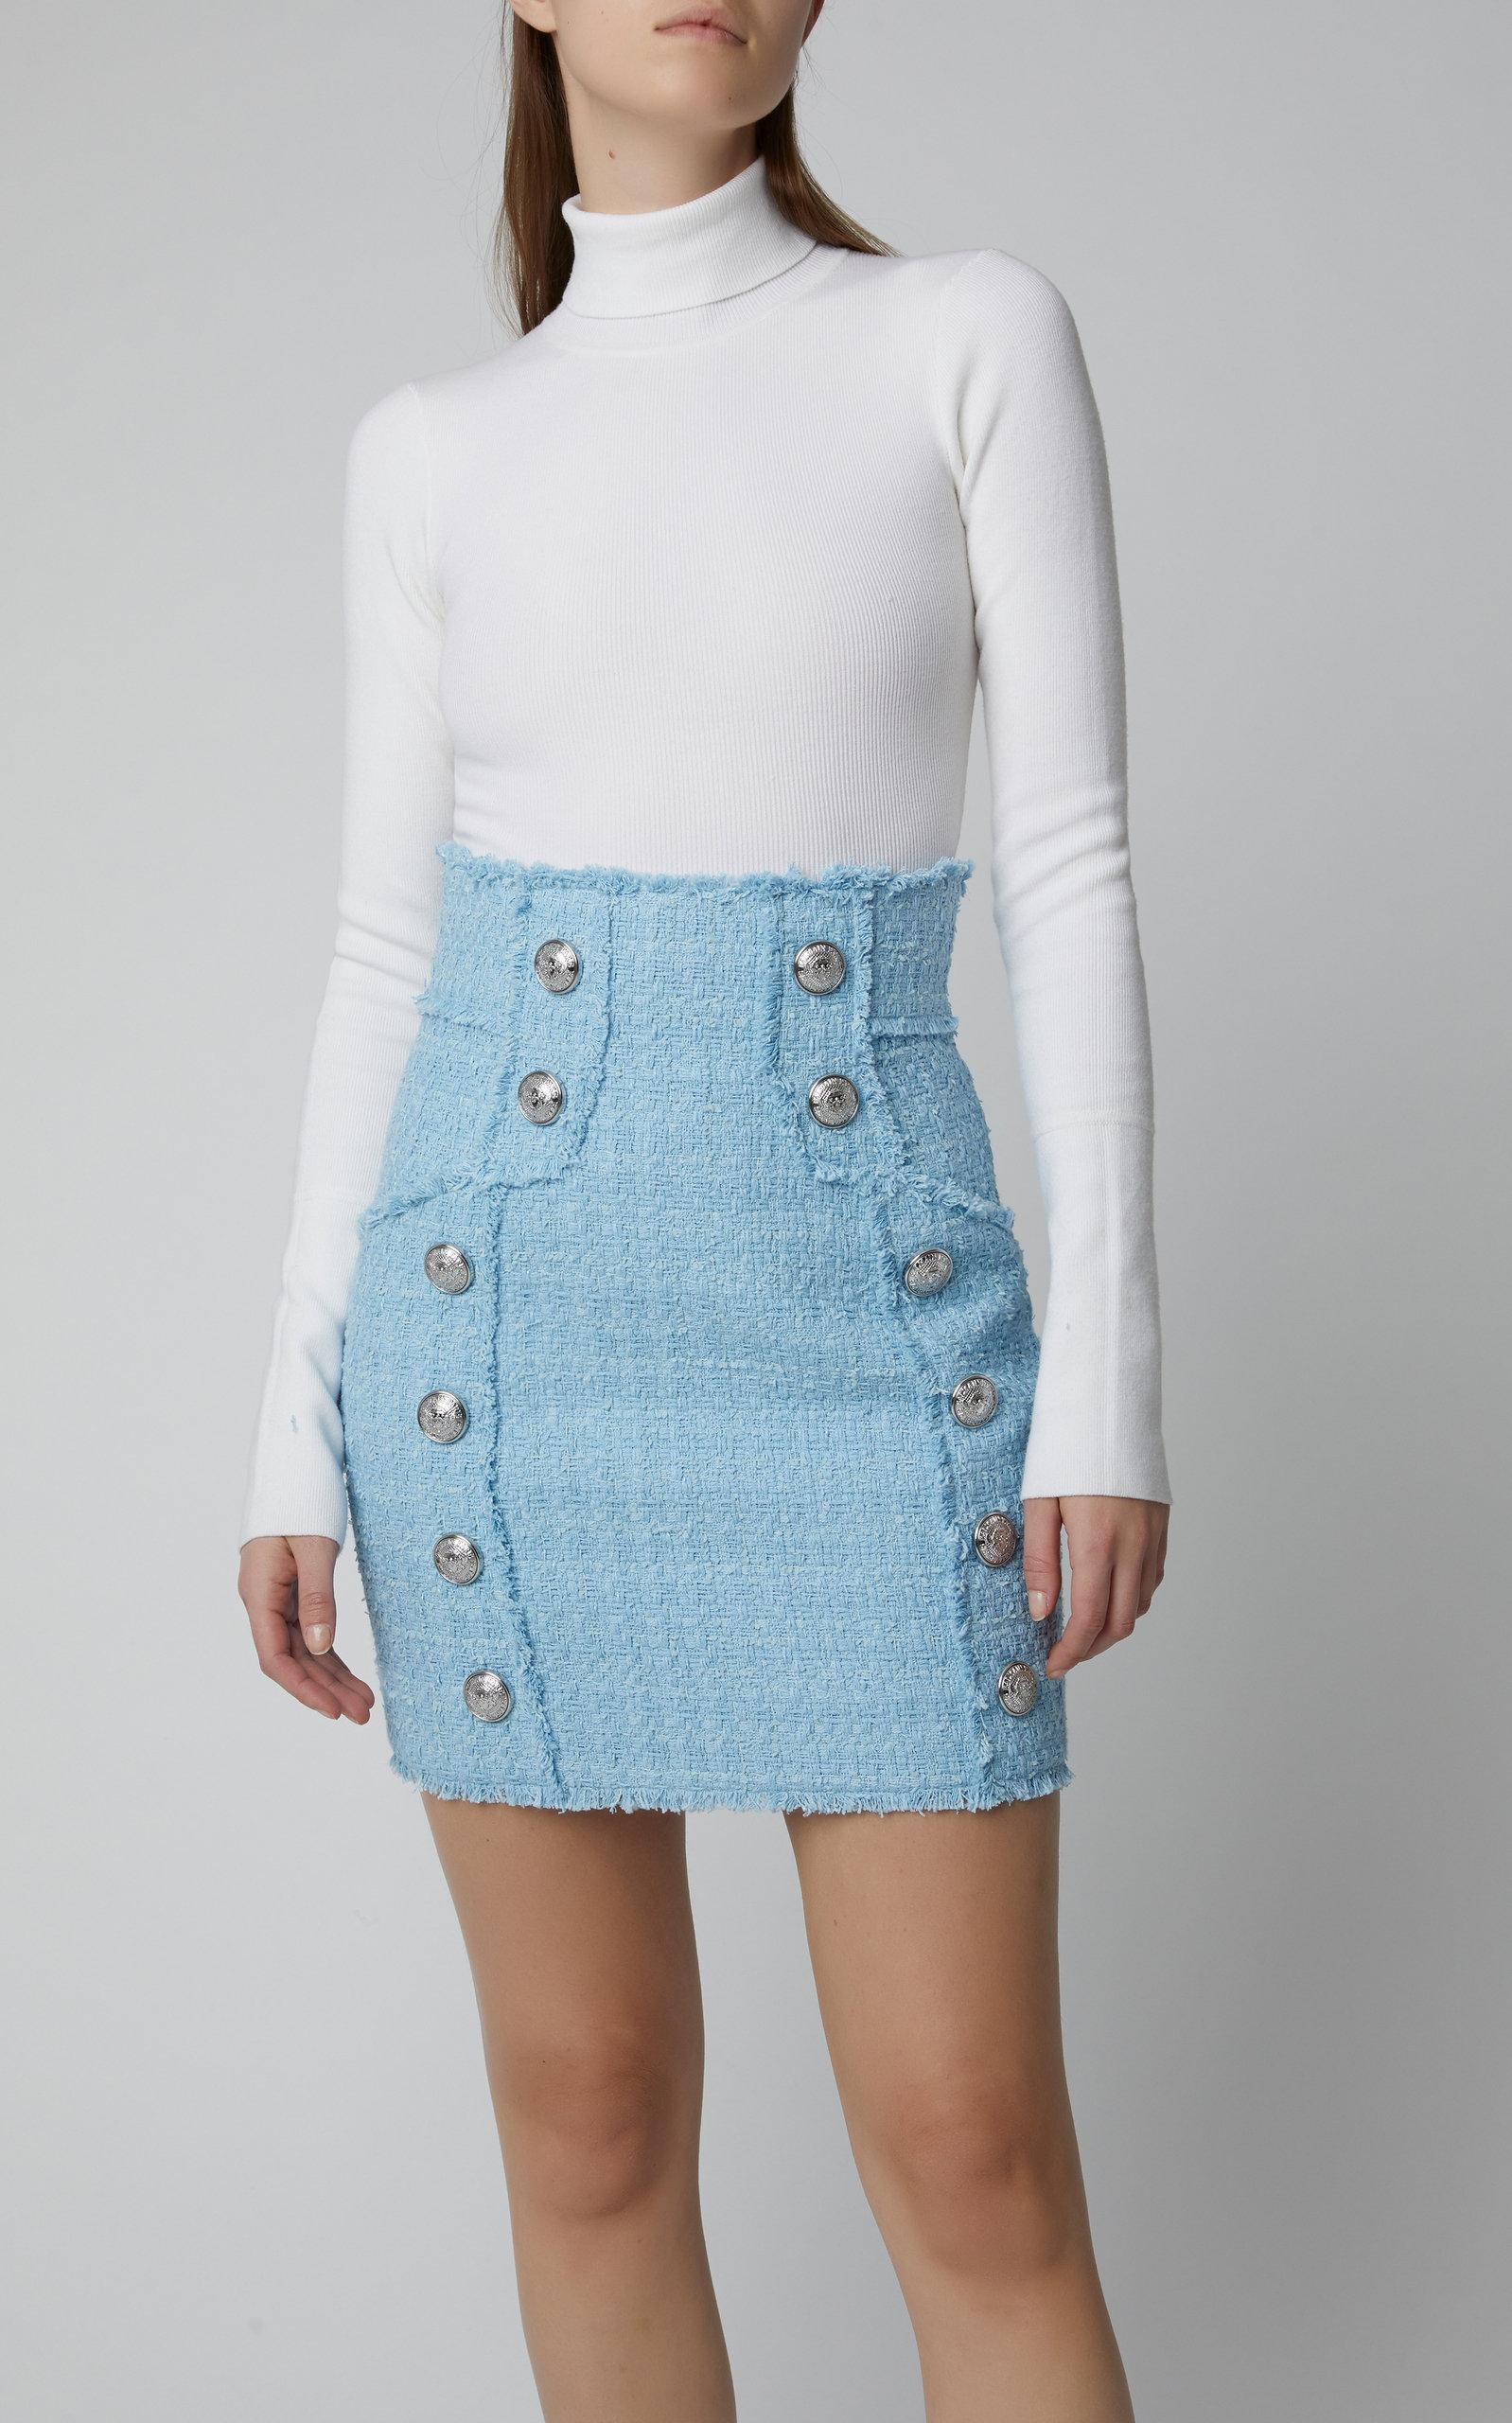 8eceb907 Balmain - Blue Button-embellished Tweed Mini Skirt - Lyst. View fullscreen